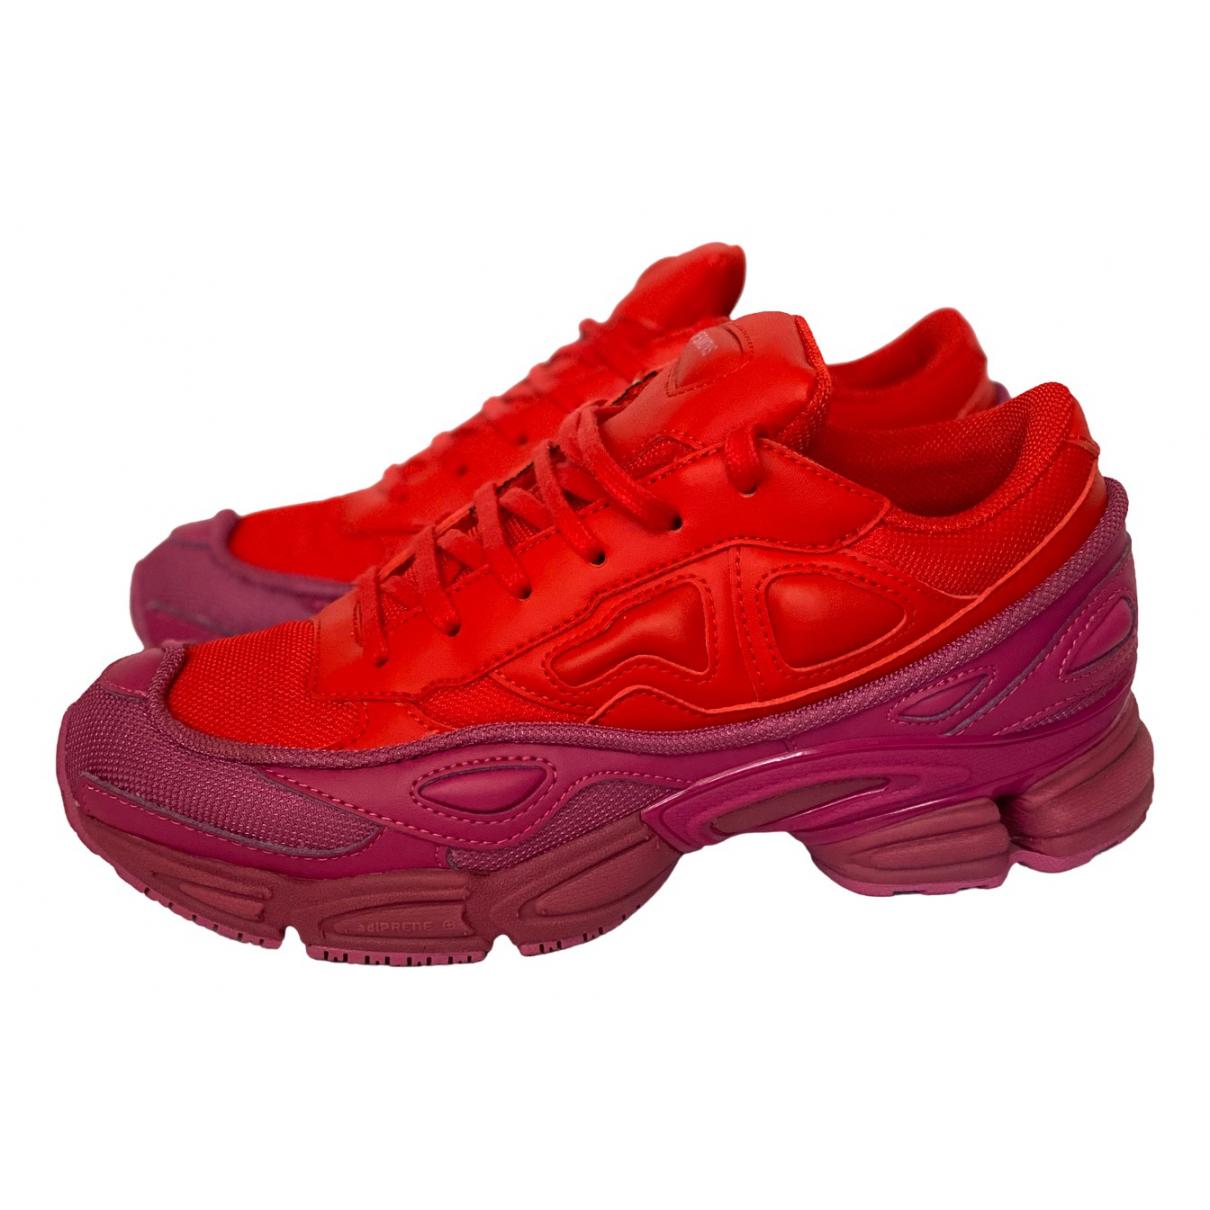 Adidas x Raf Simons Ozweego 2 leather trainers